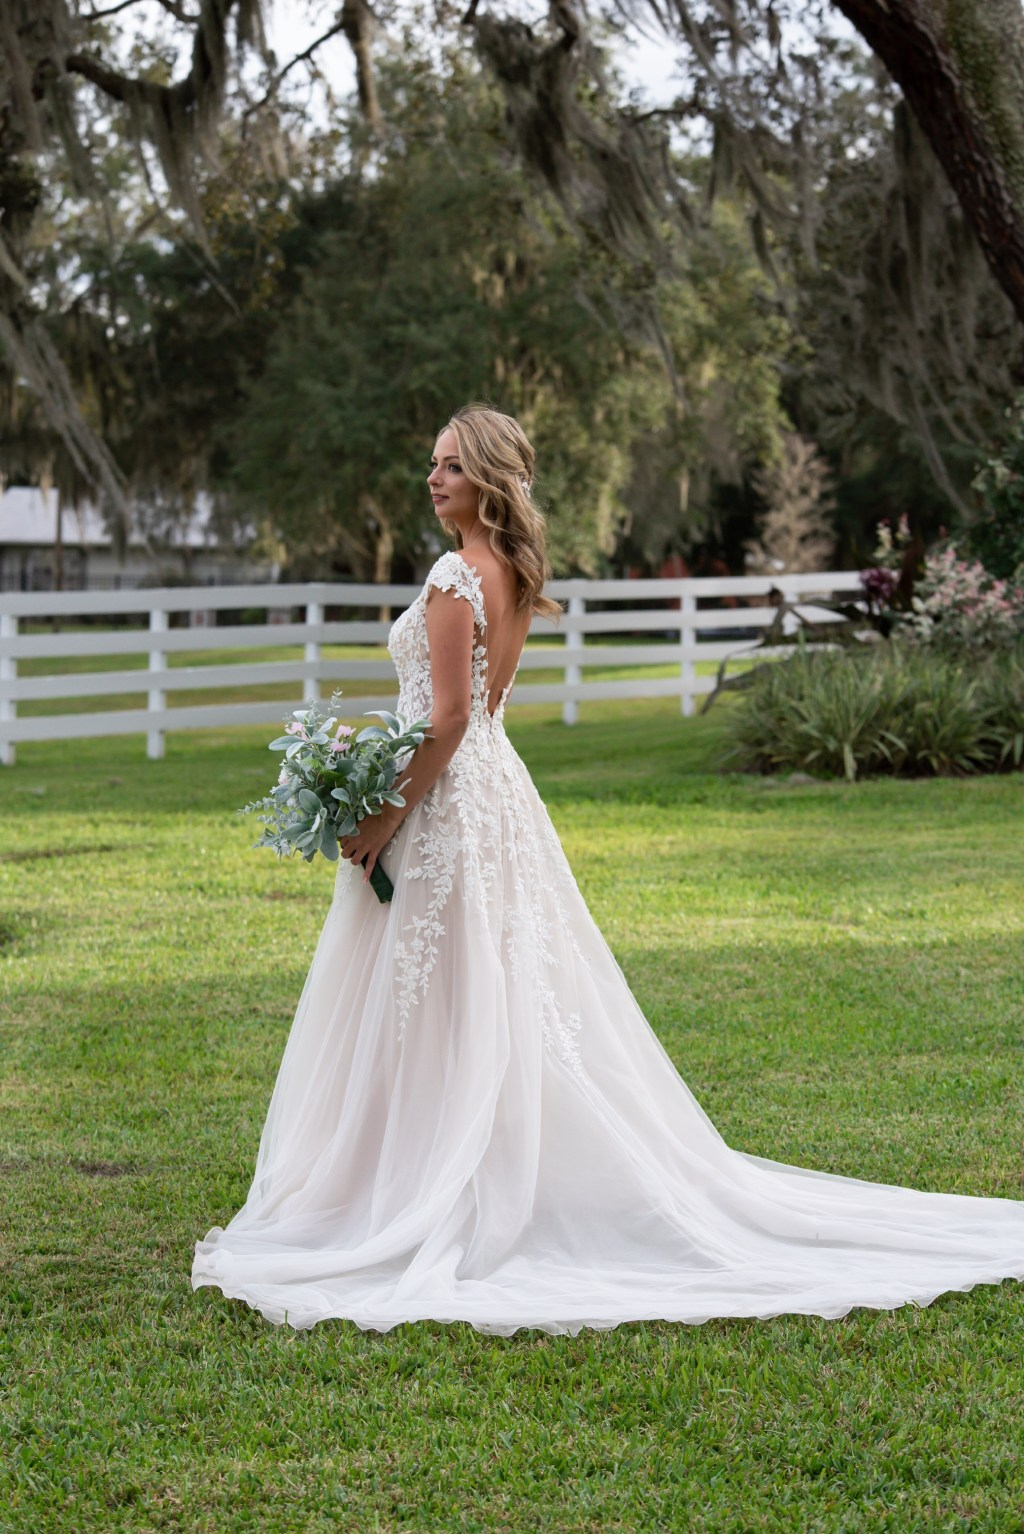 Gorgeous wedding dress for Florida wedding